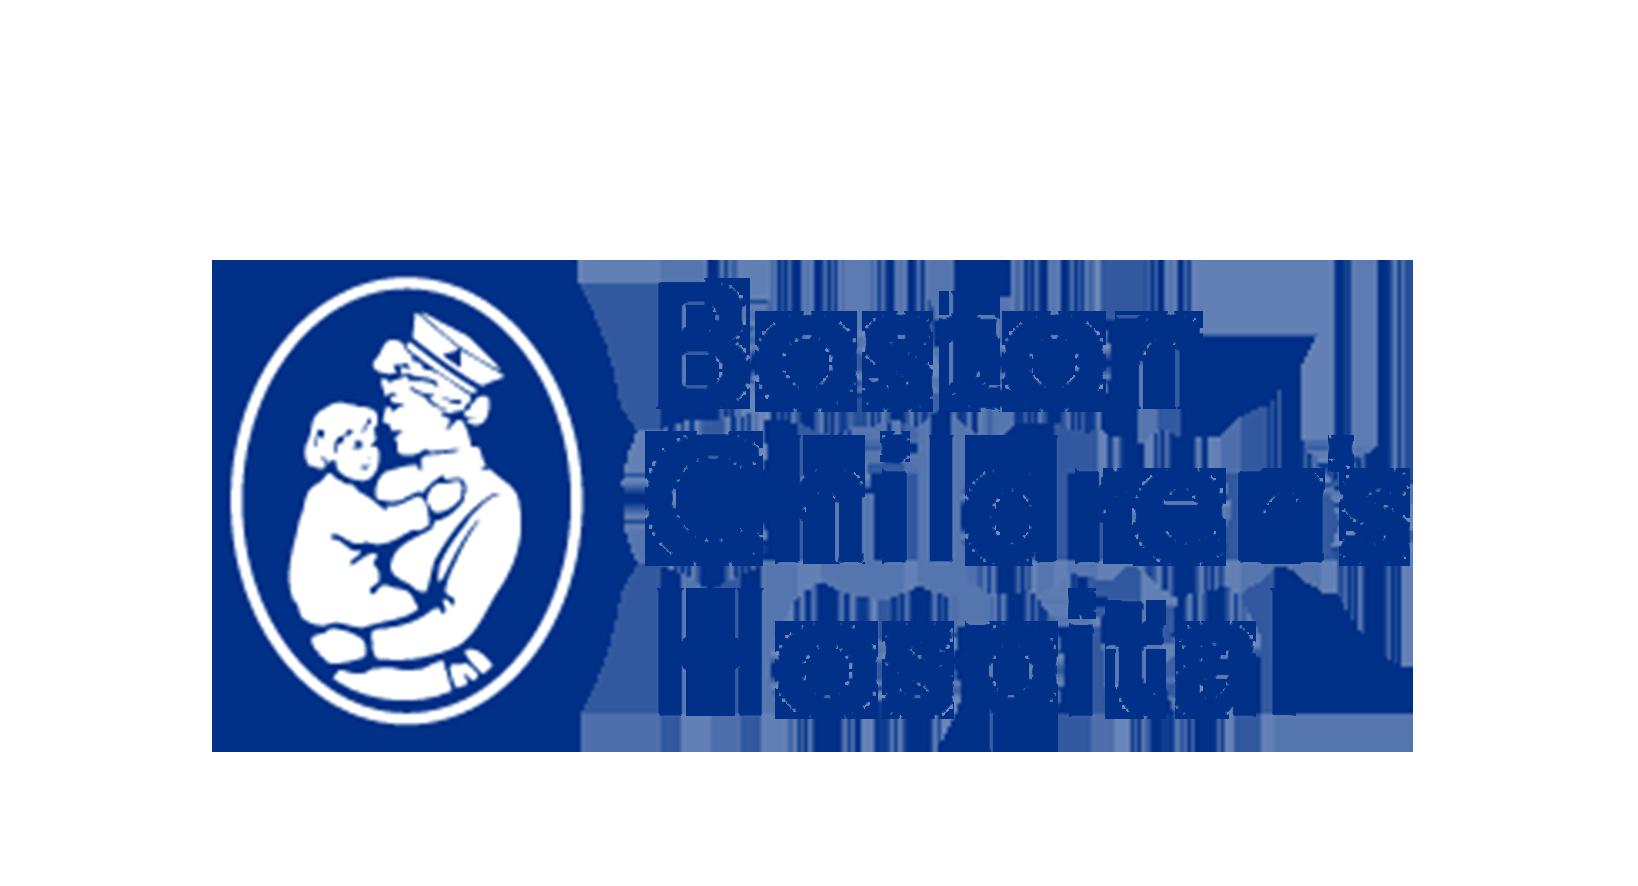 Boston Children's Hospital